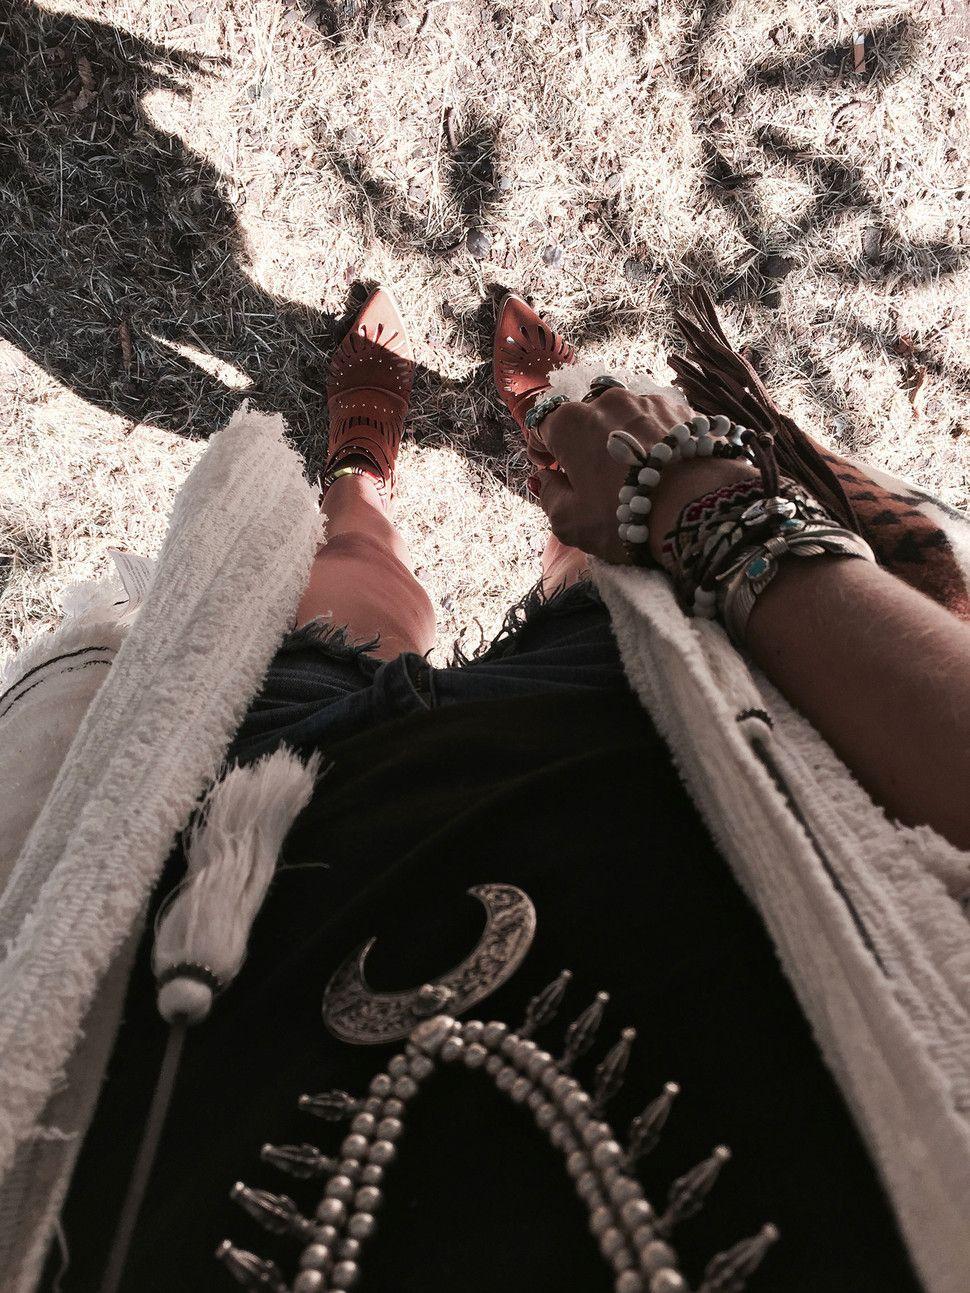 ROCK EN SEINE FESTIVAL W/ PULL AND BEAR Little boho blog - Fashion and travel blog  #fashion #blogger #outfit #festival #pullandbear